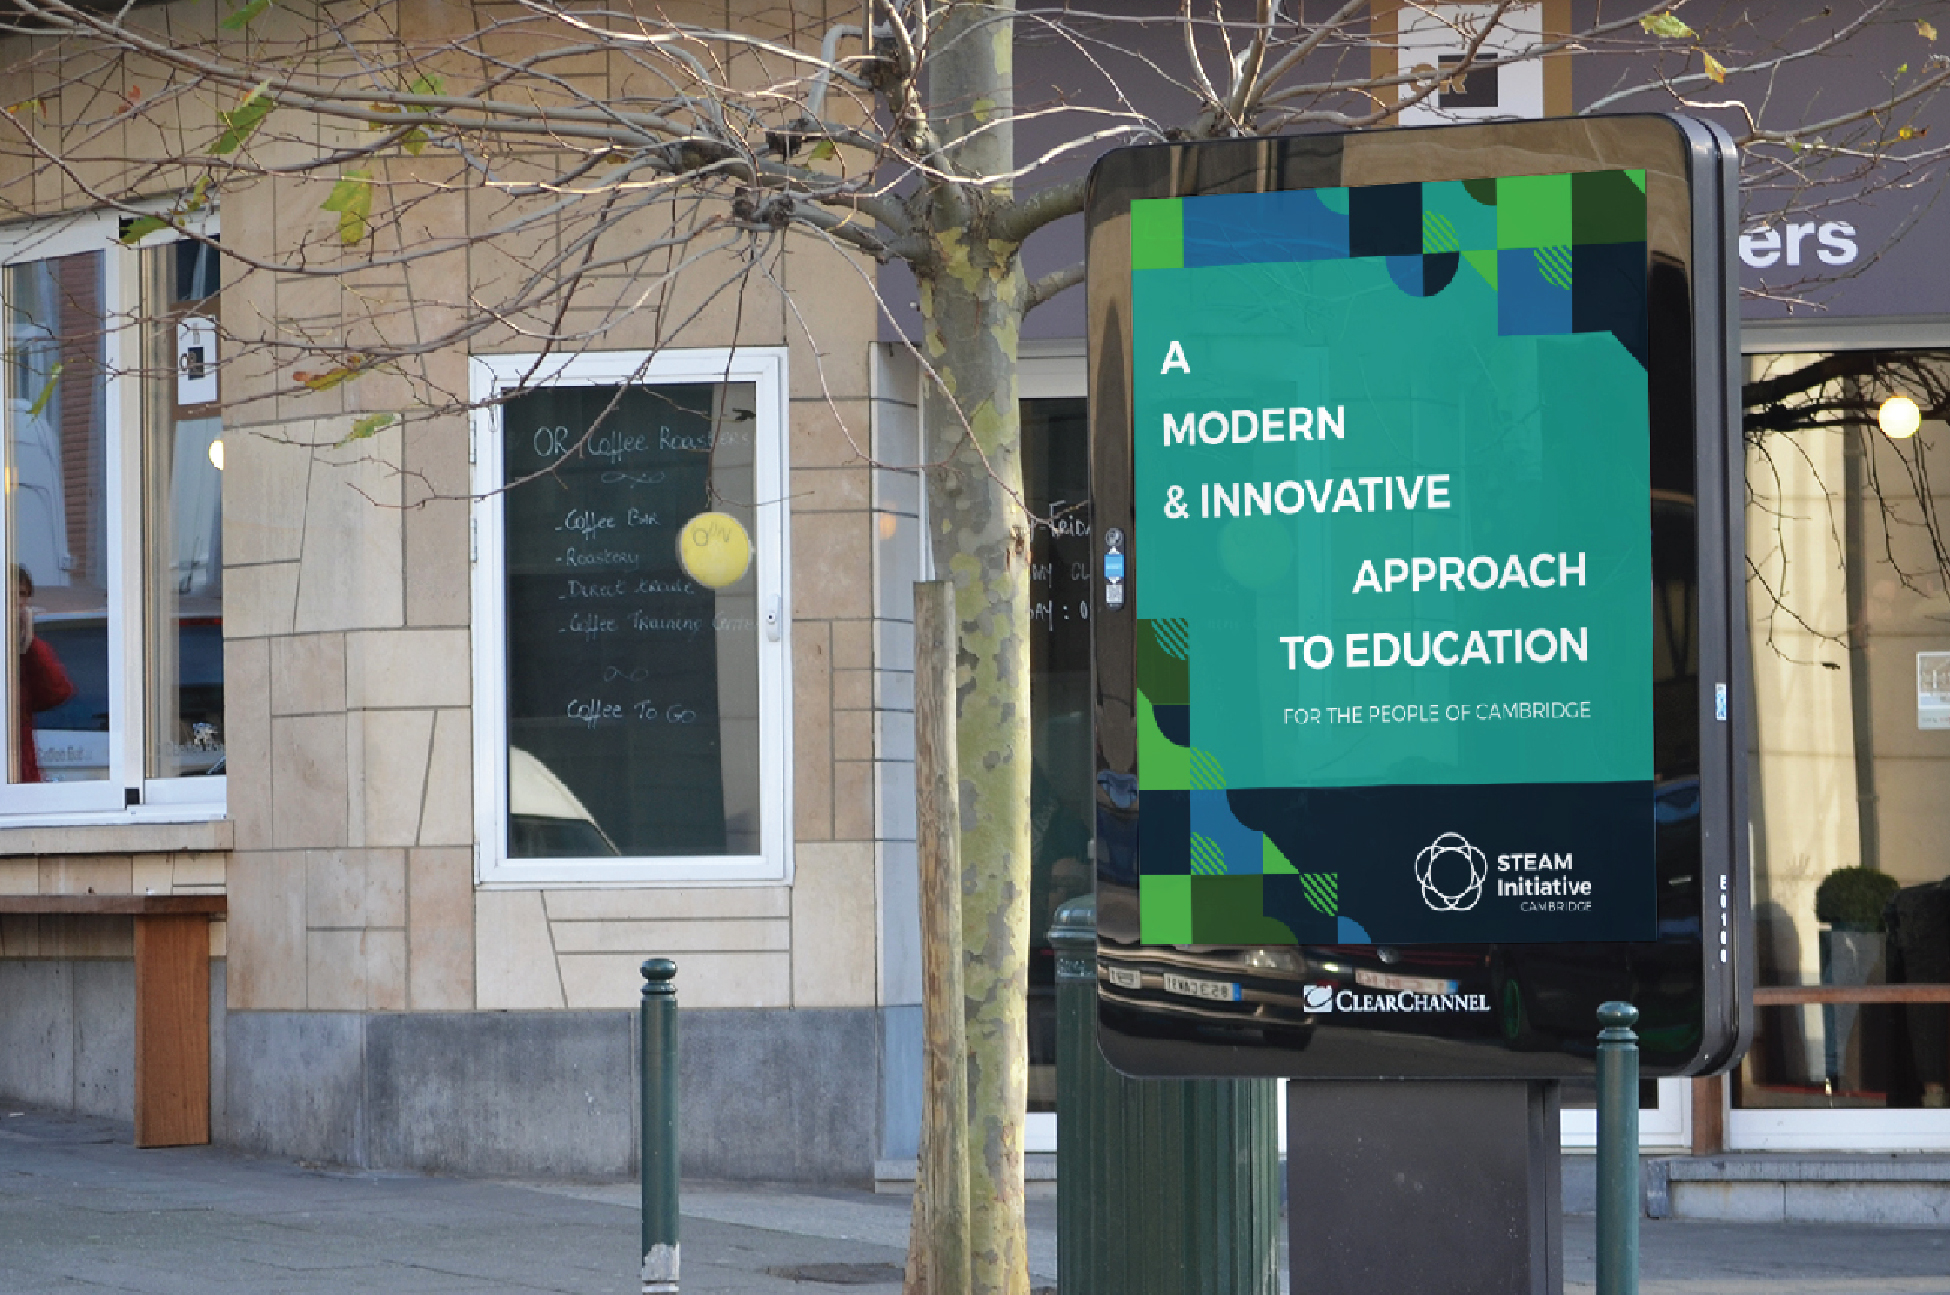 Cambridge STEAM Initiative Poster in City